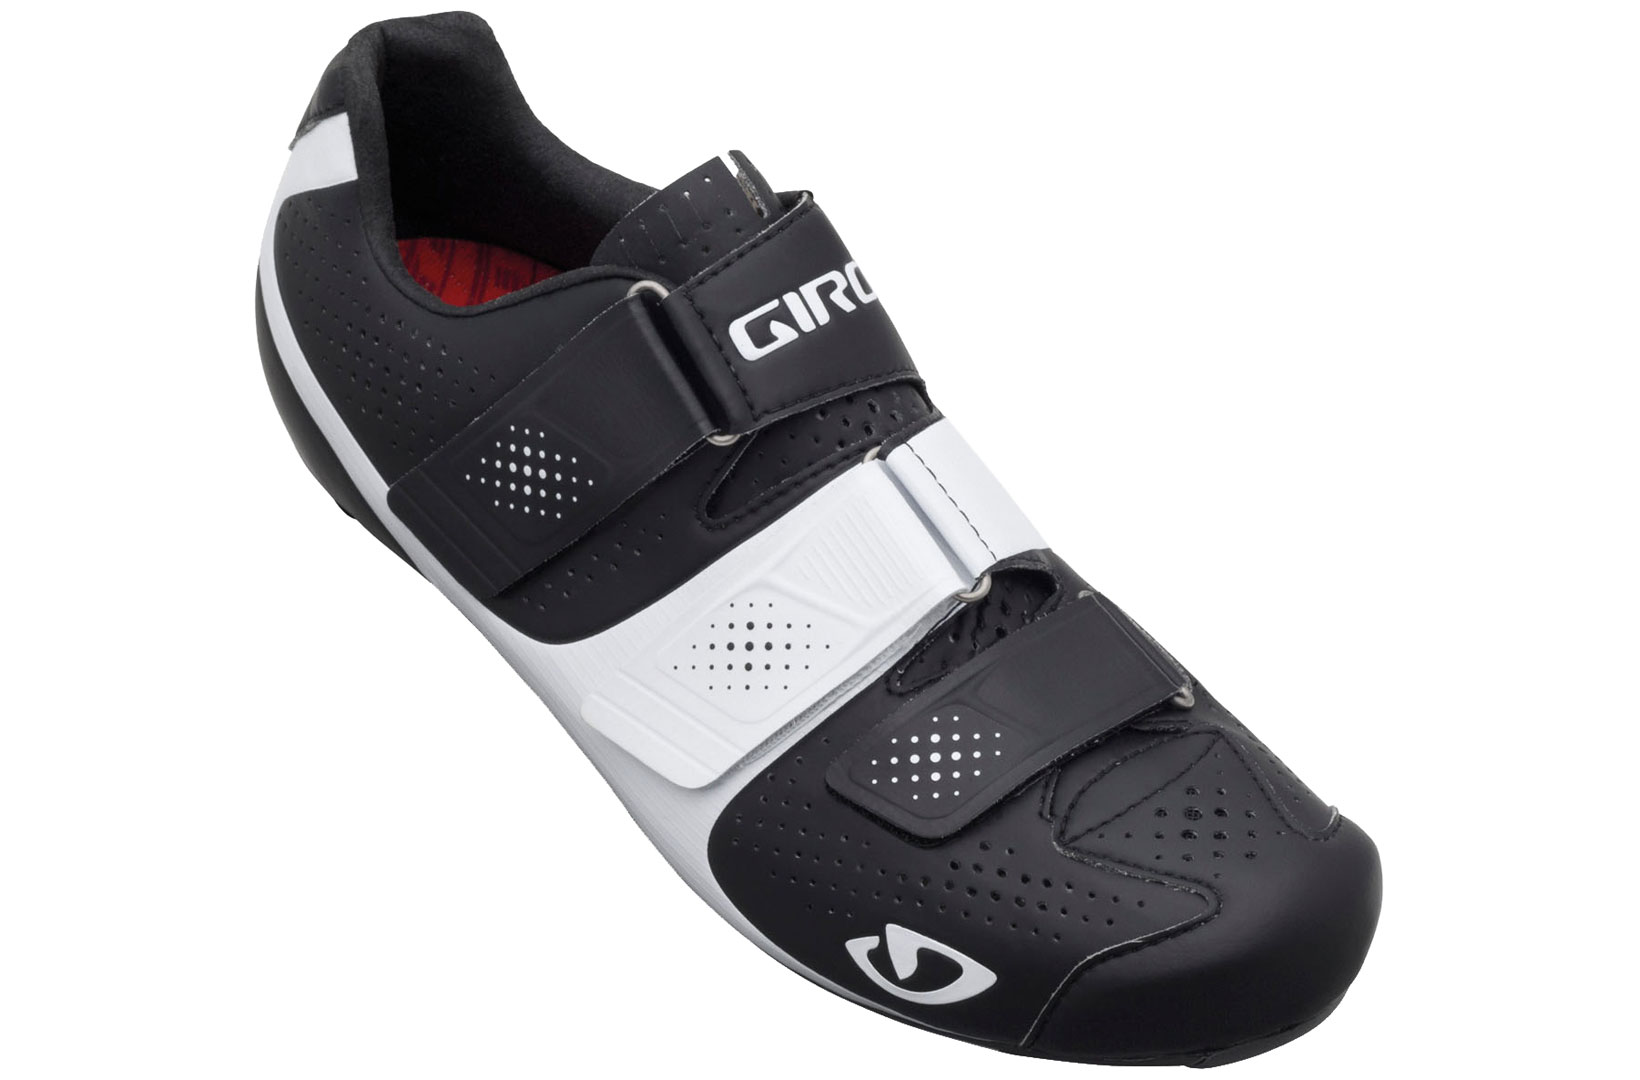 Giro Prolight SLX